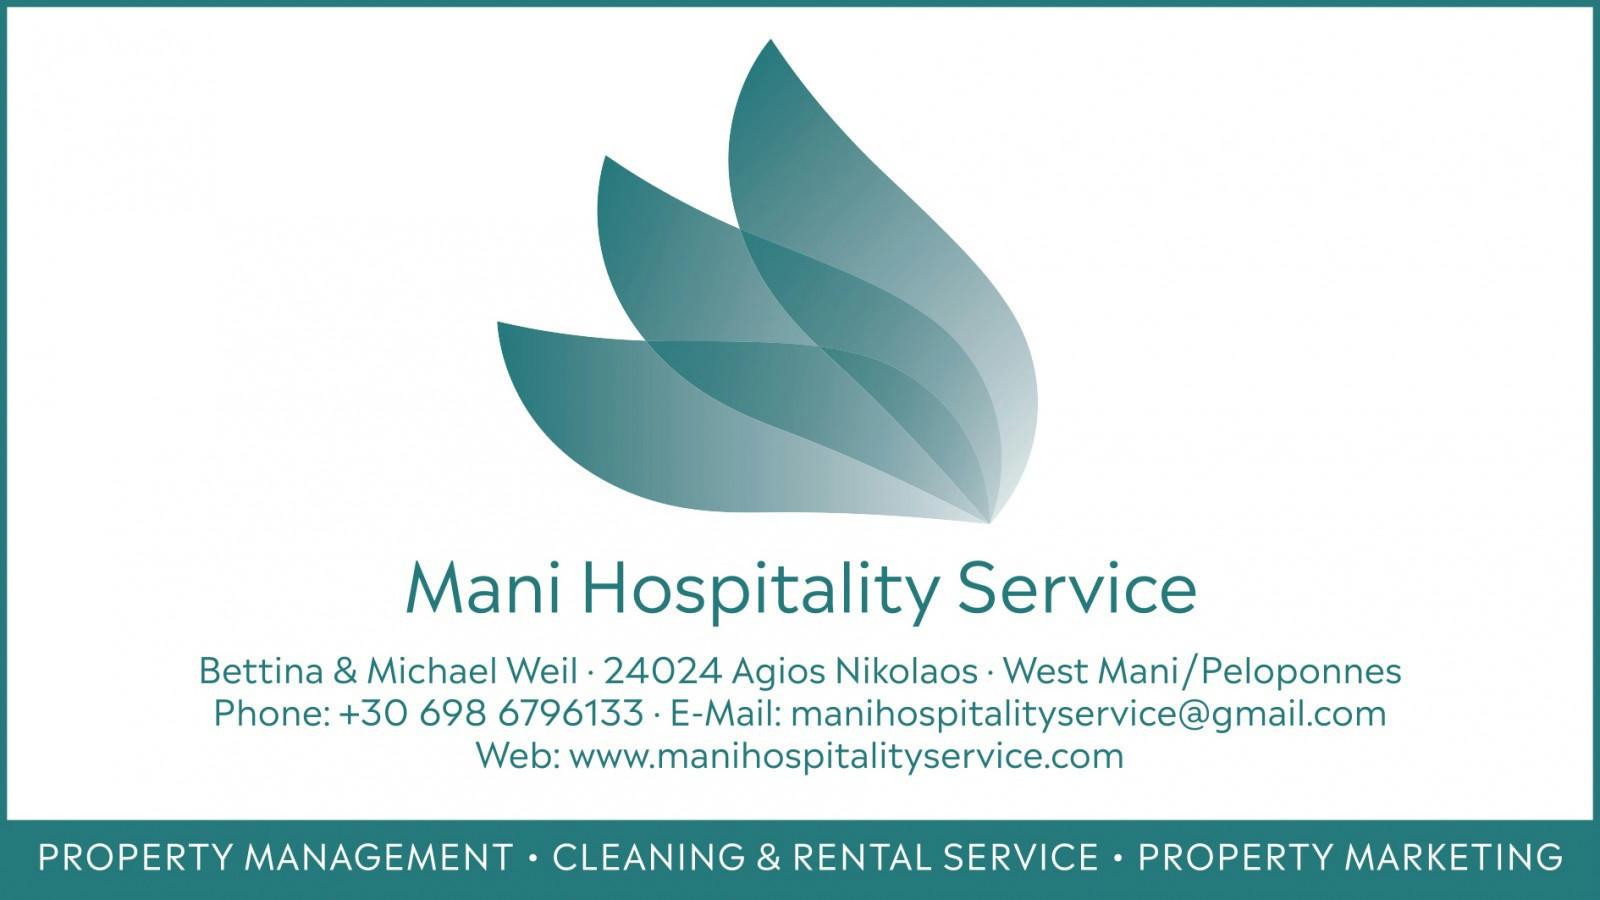 Mani Hospitality Service